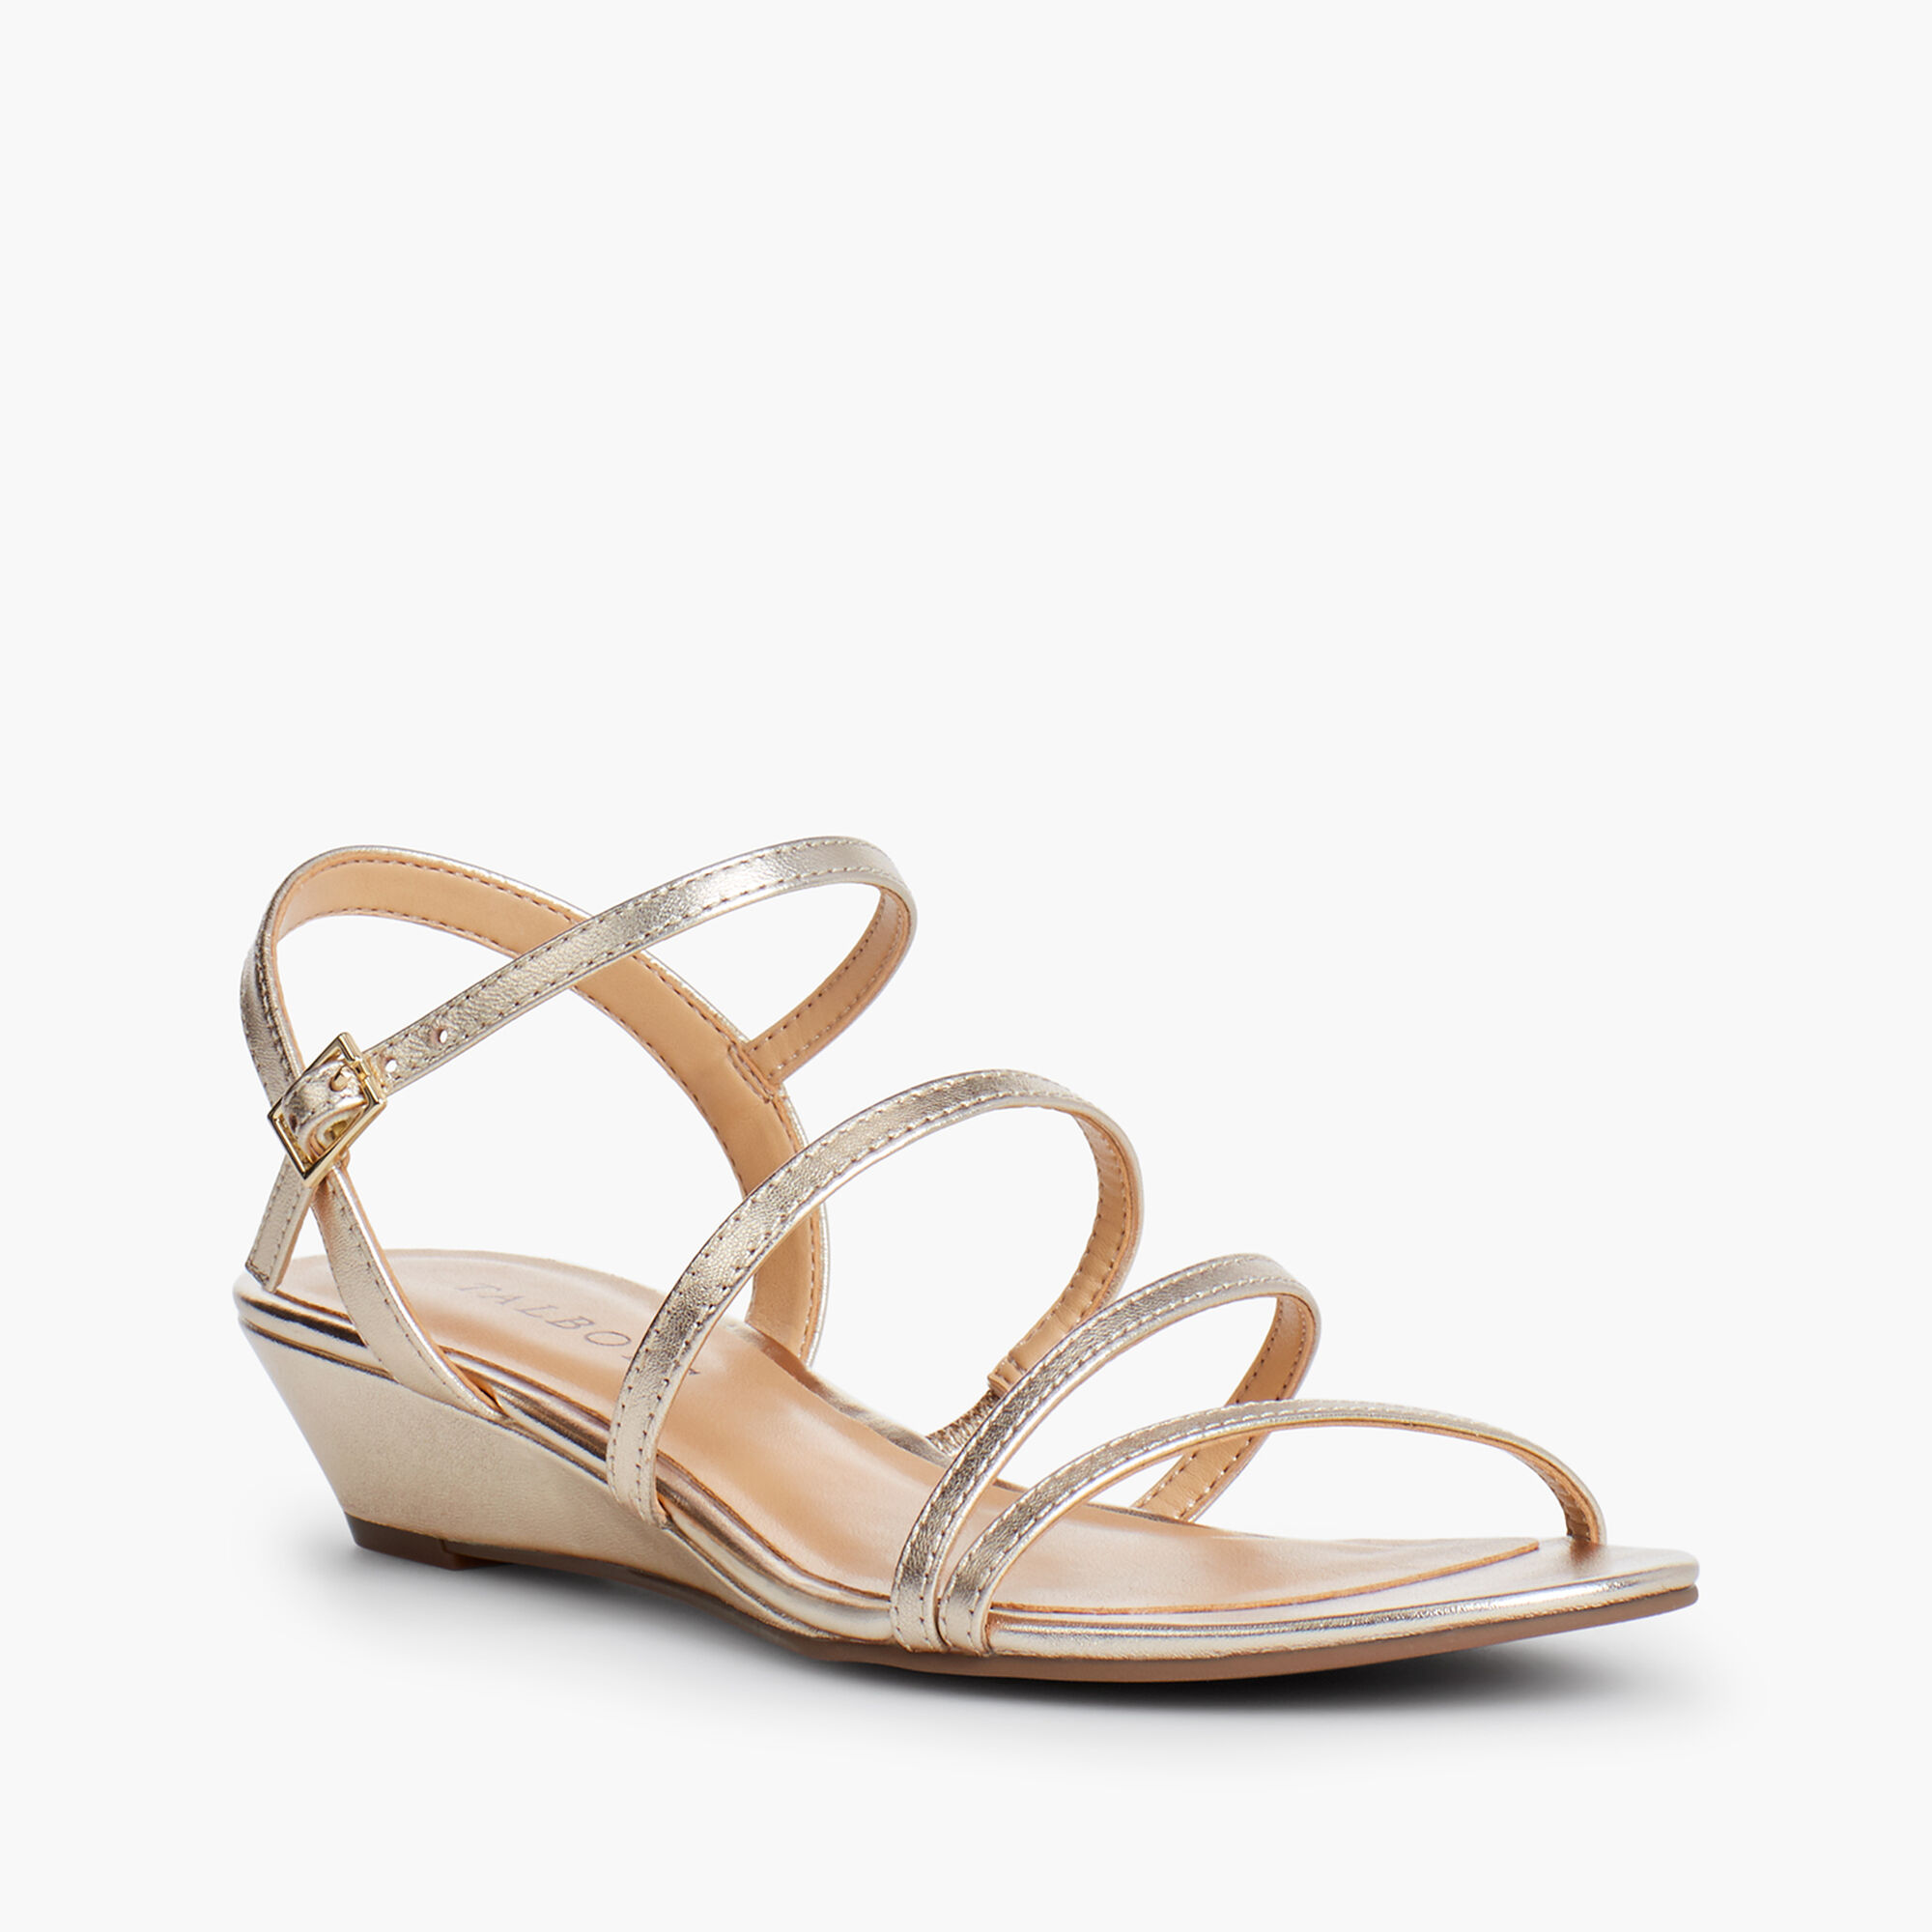 ad49603deac Capri Multi-Strap Mini-Wedge Sandals - Metallic Opens a New Window.